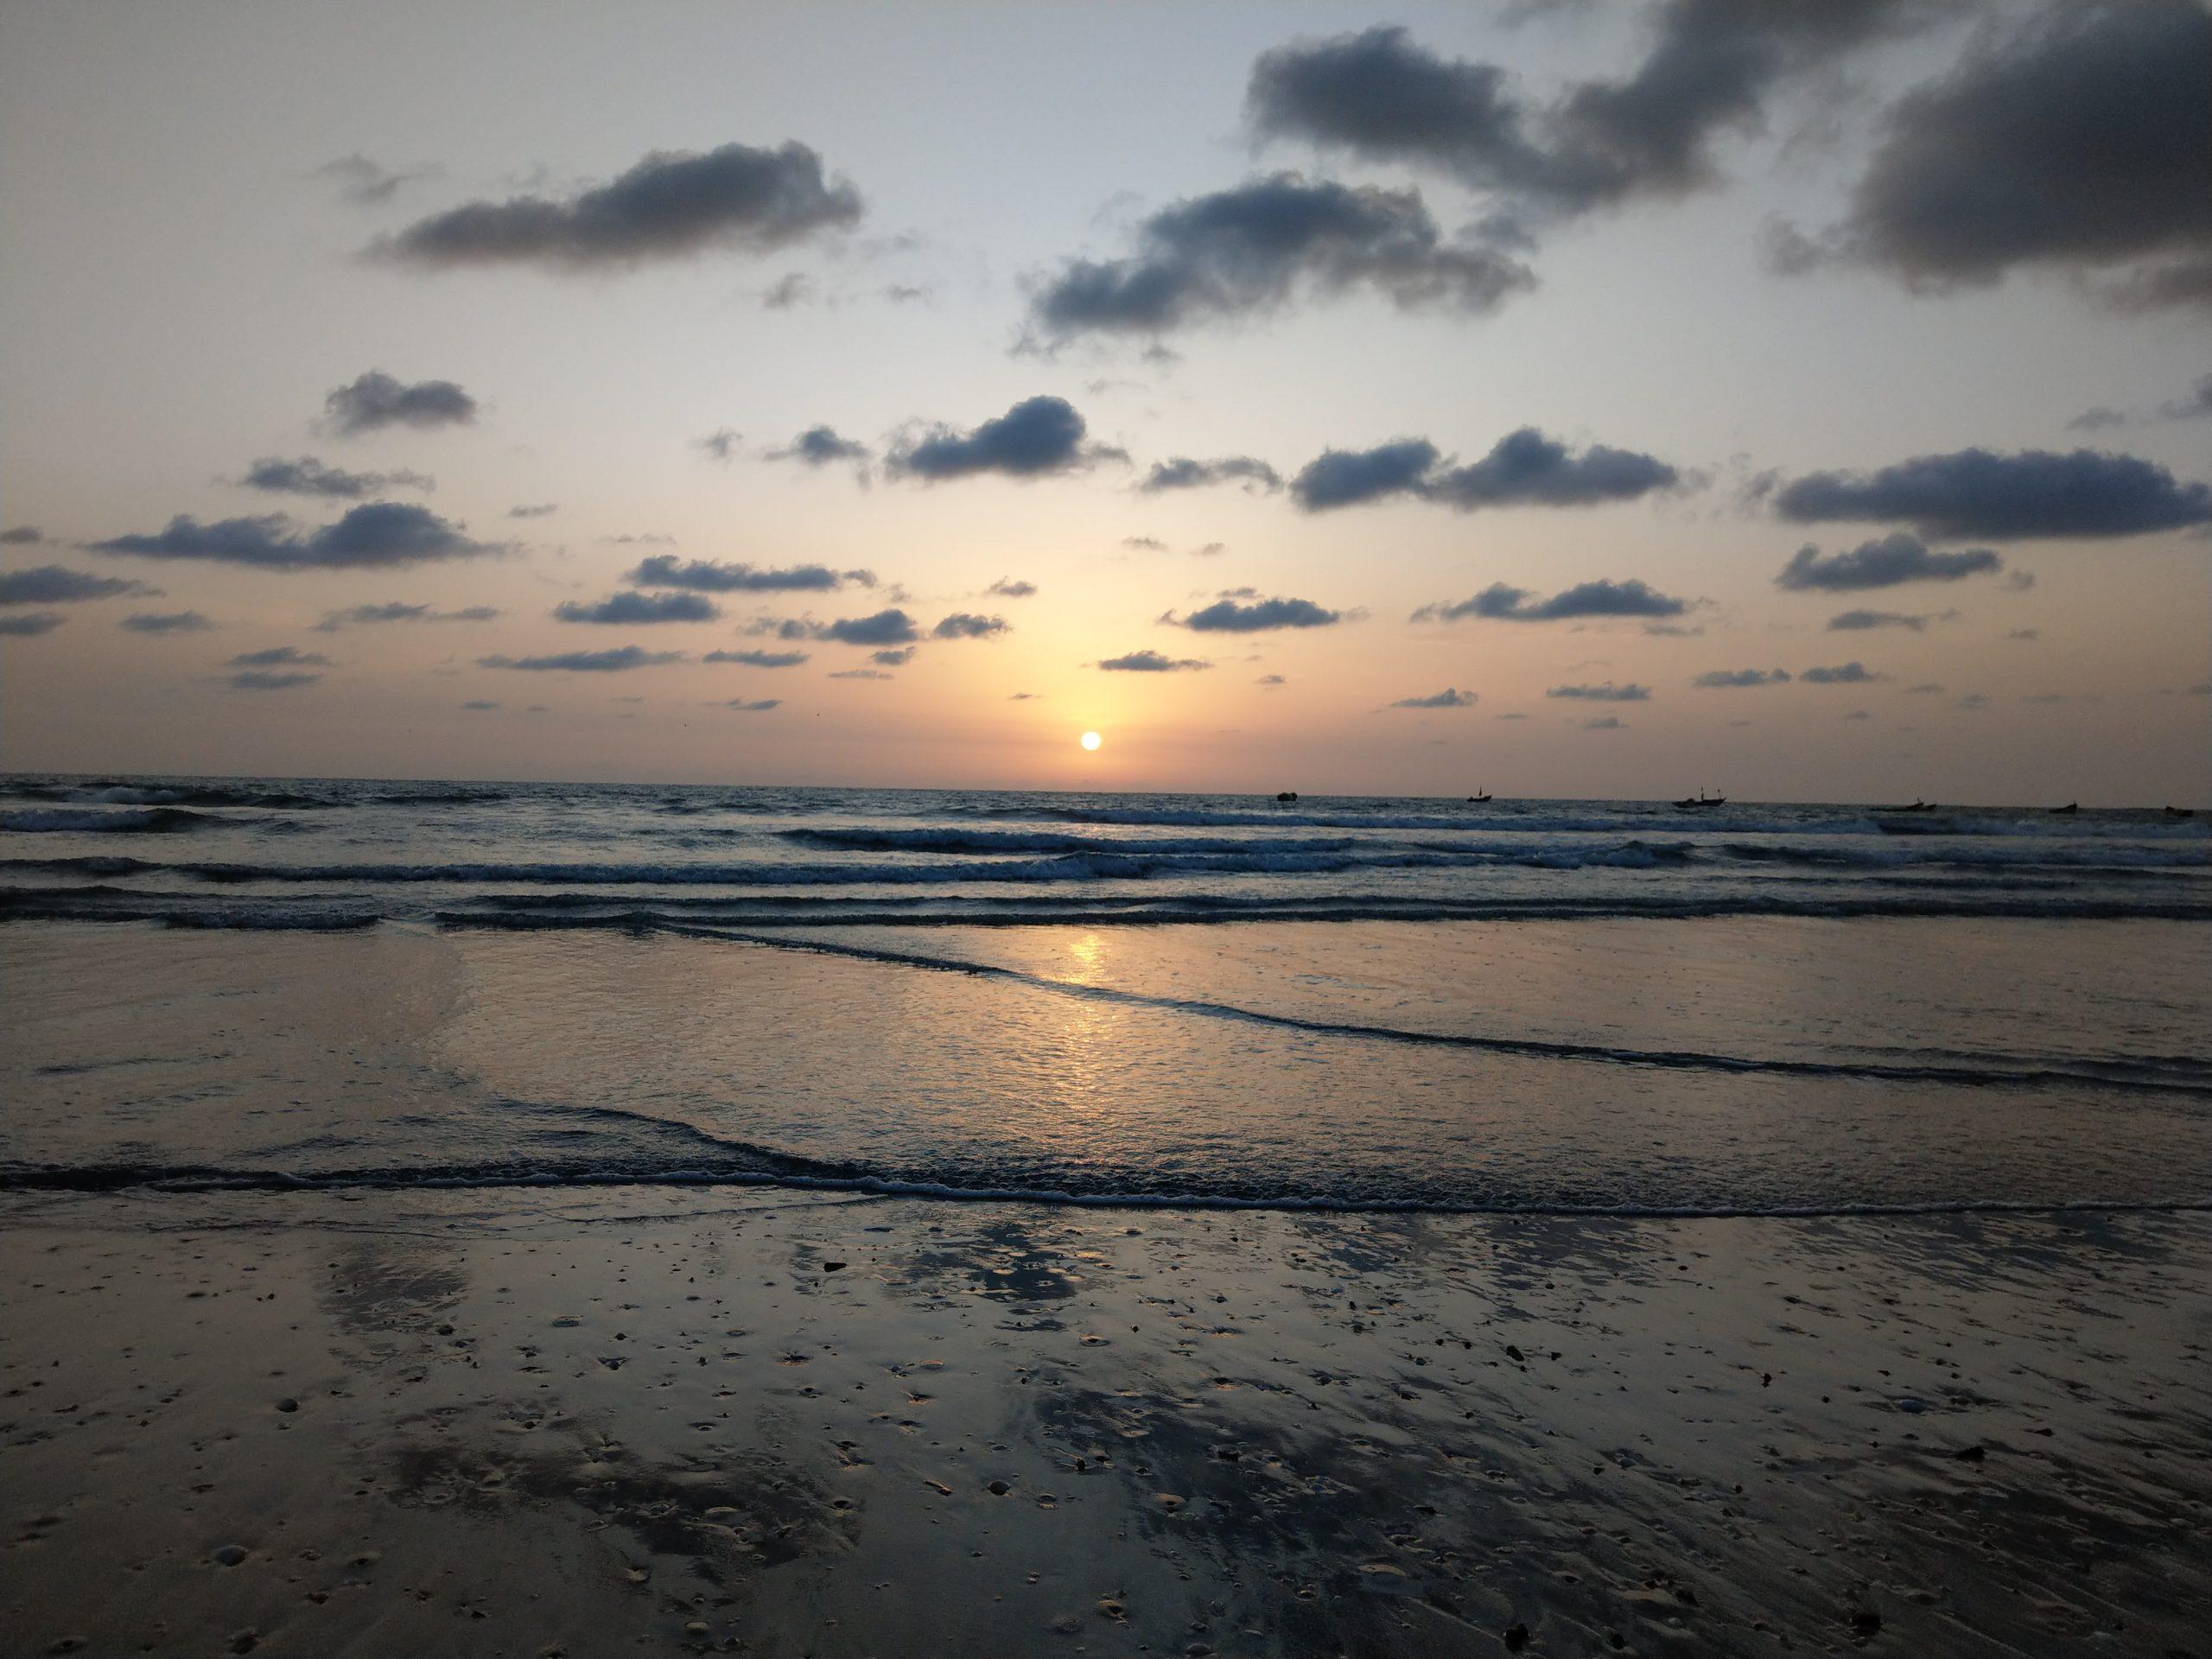 Paradise Beach - Sunset